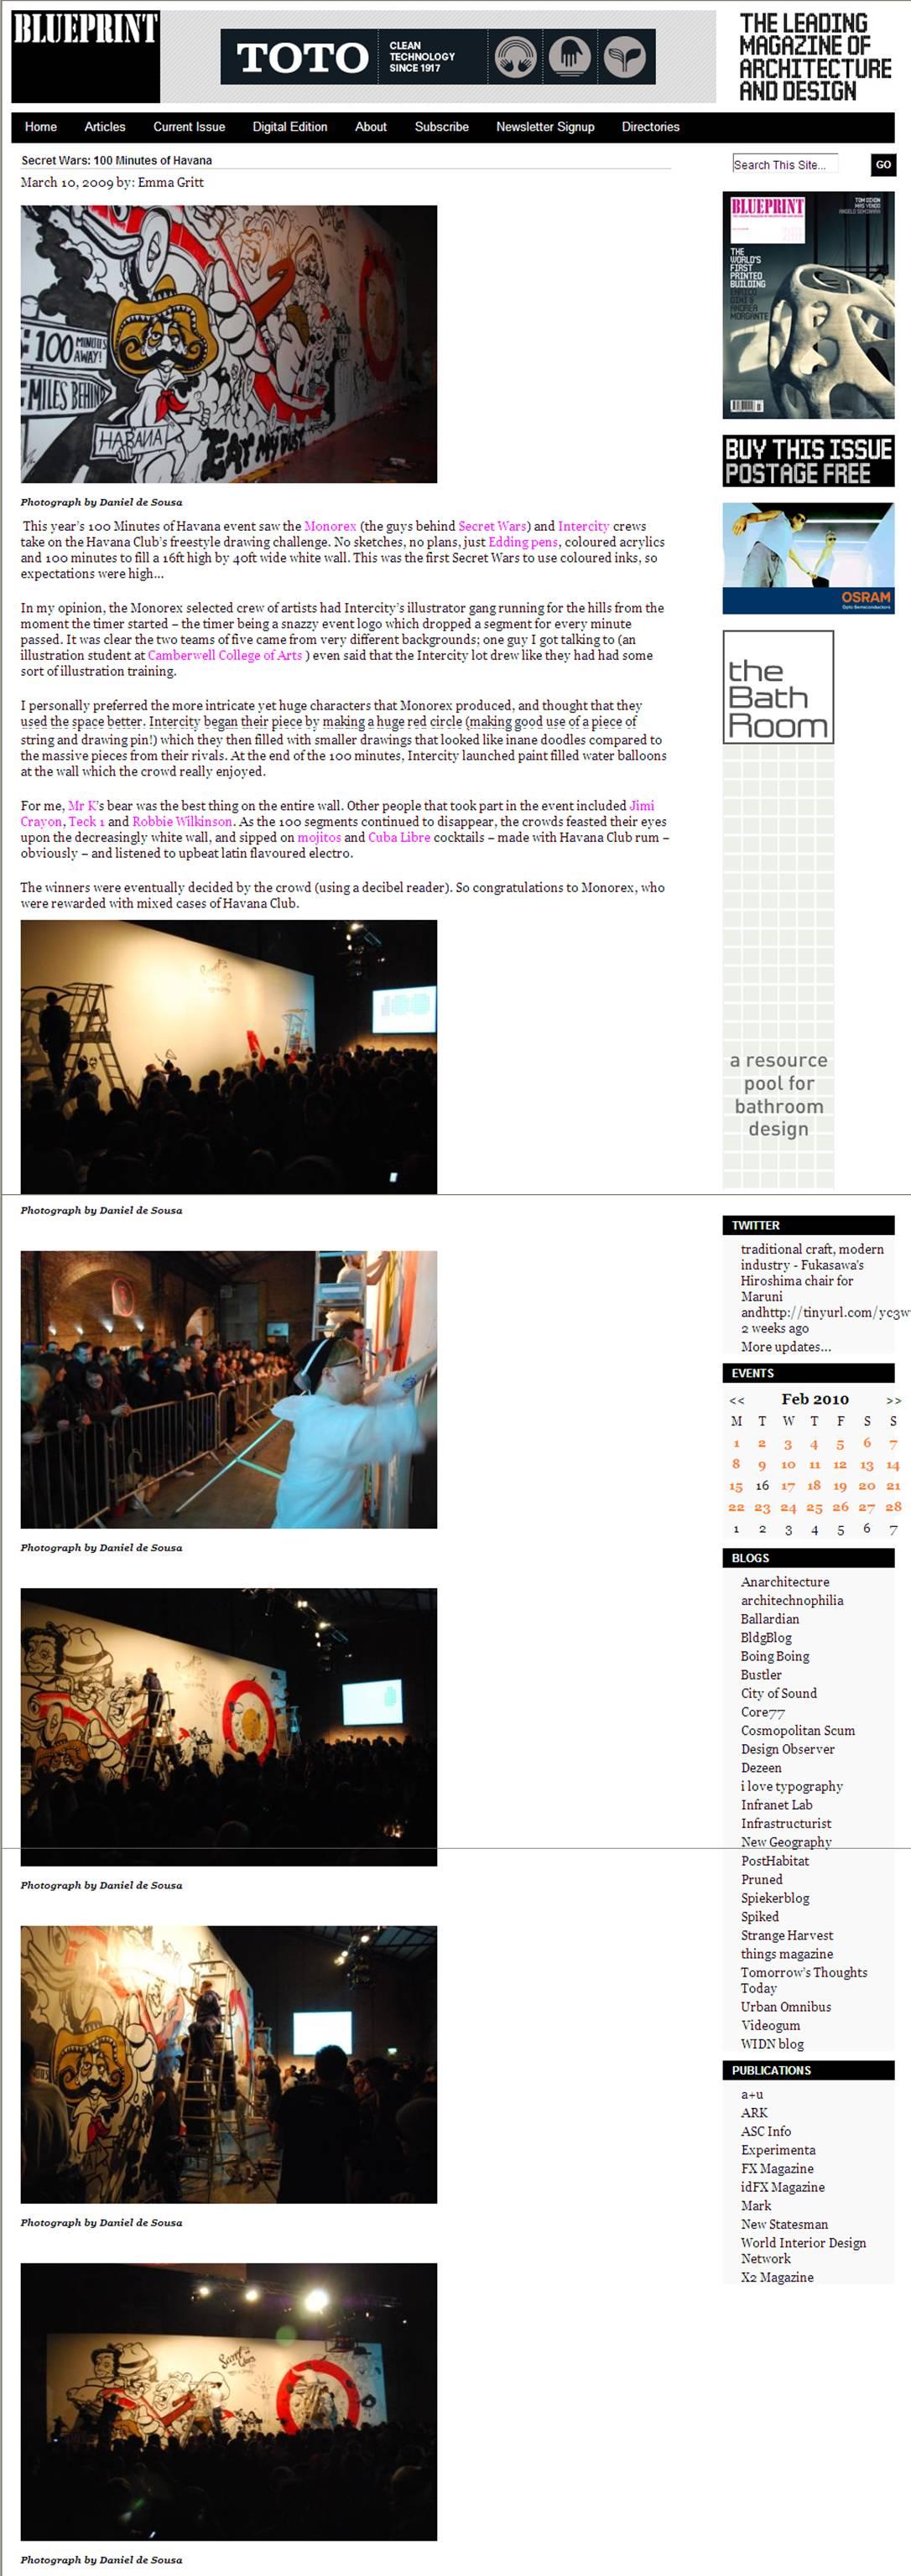 Blueprint magazine kara simsek tags blueprint magazine illustration review street art malvernweather Gallery